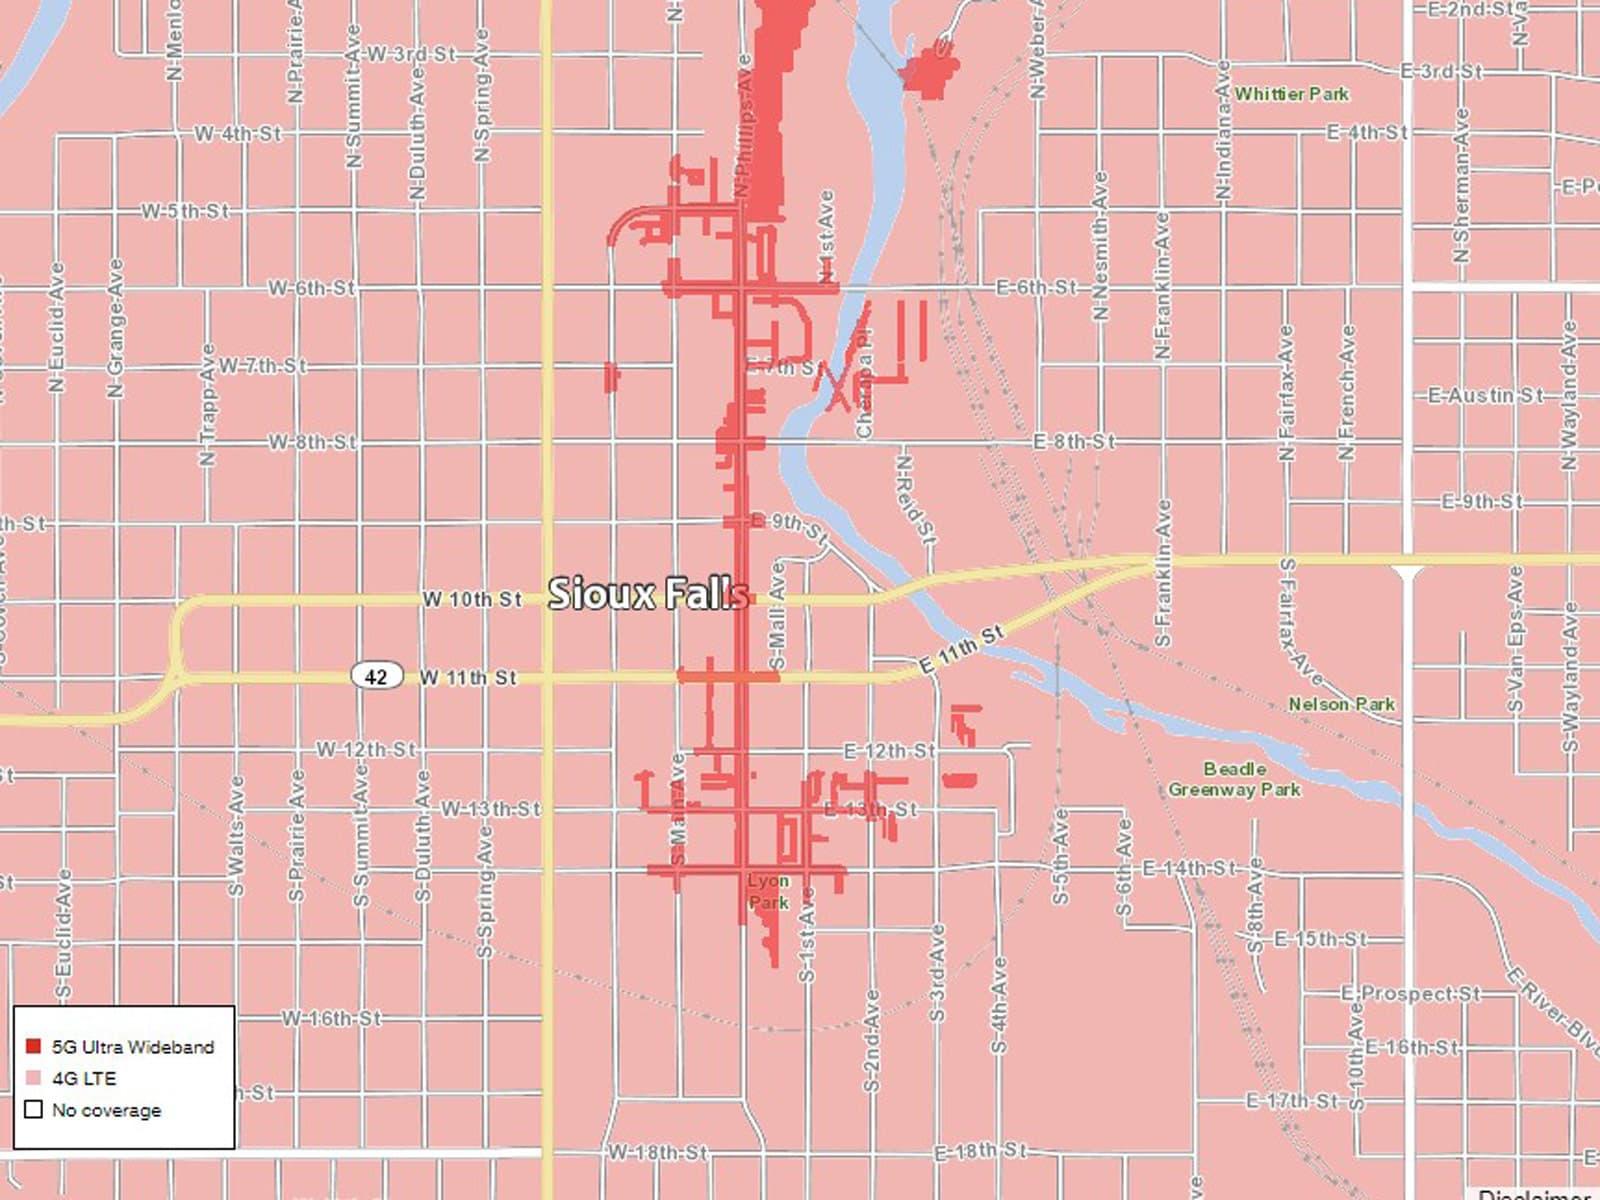 Verizon Sioux Falls 5G coverage map